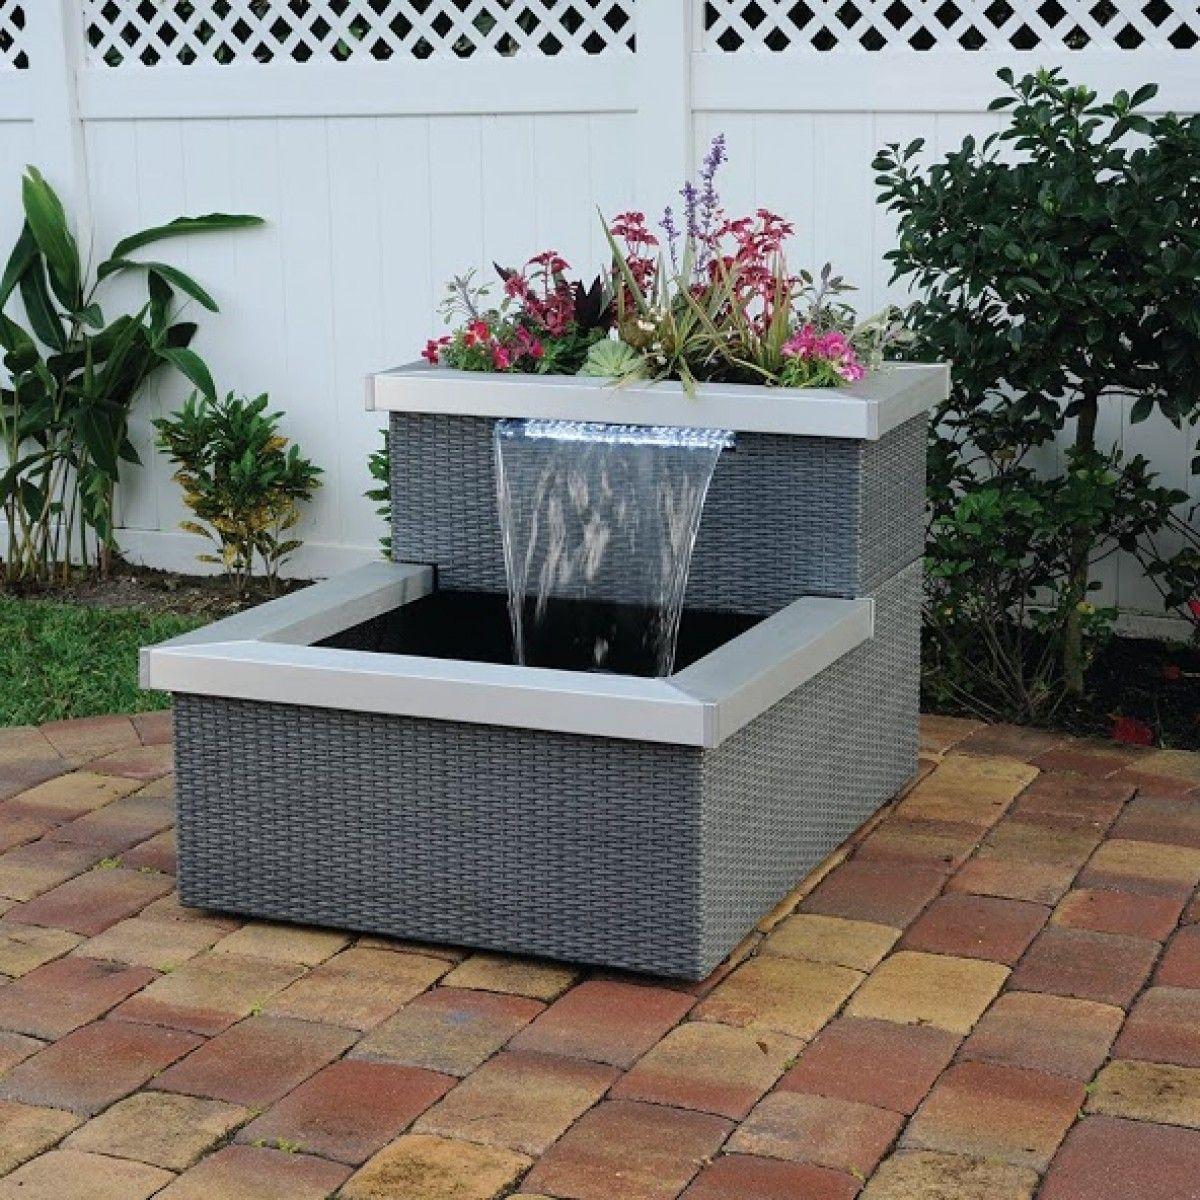 Indoor Aquaponics System Designs Earthship Pinterest